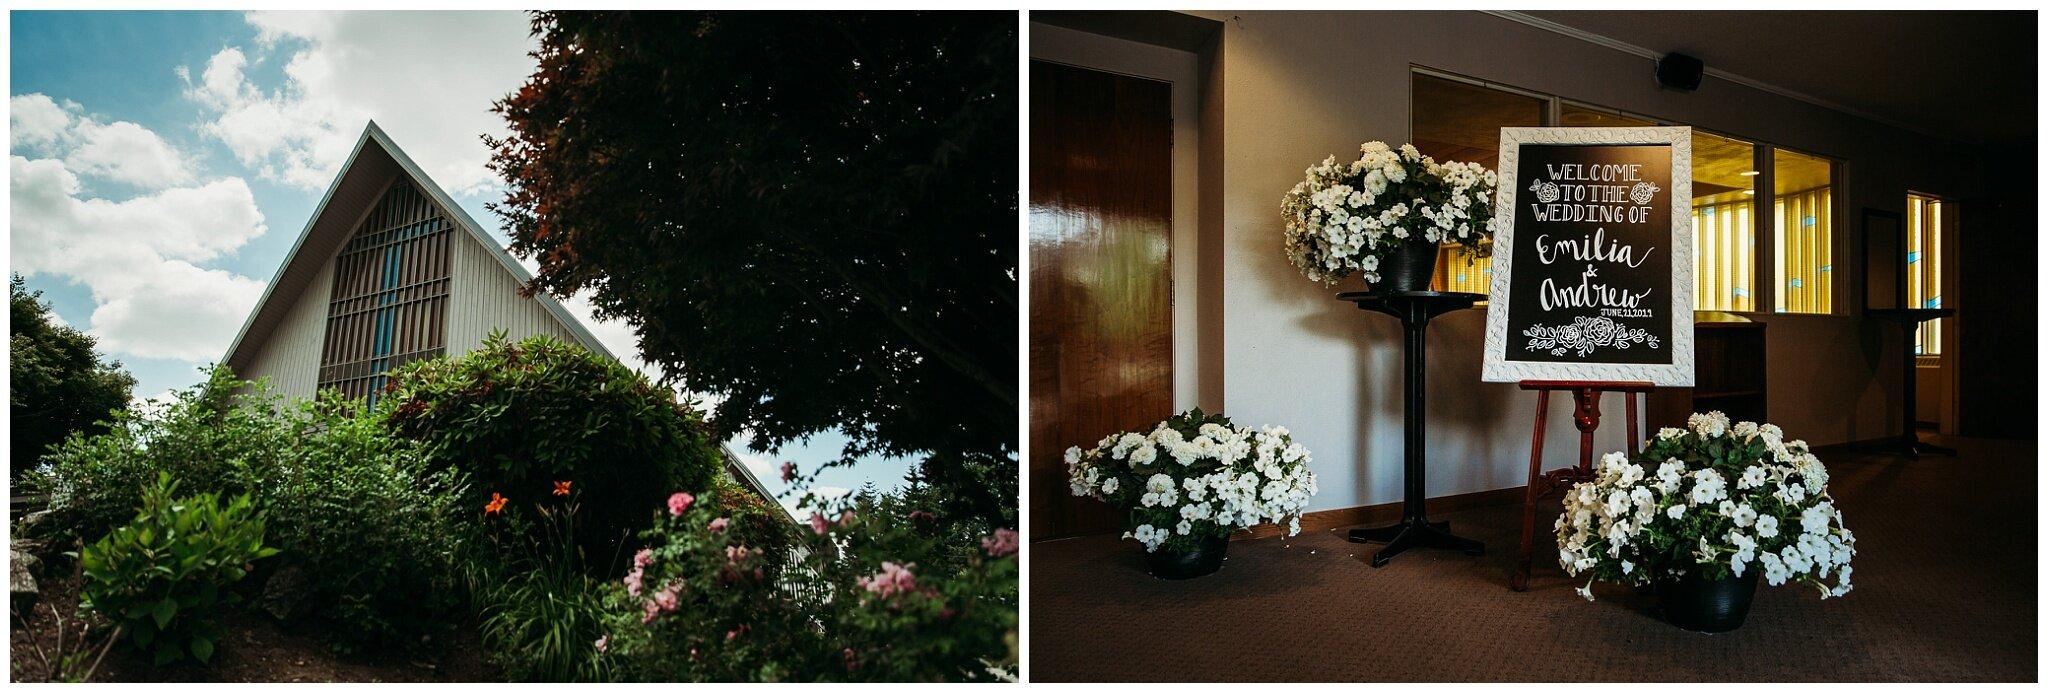 Eighteen Pastures Mission  BC Abbotsford BC Christian Wedding Photographer Summer Bride Groom Inspo_0001.jpg